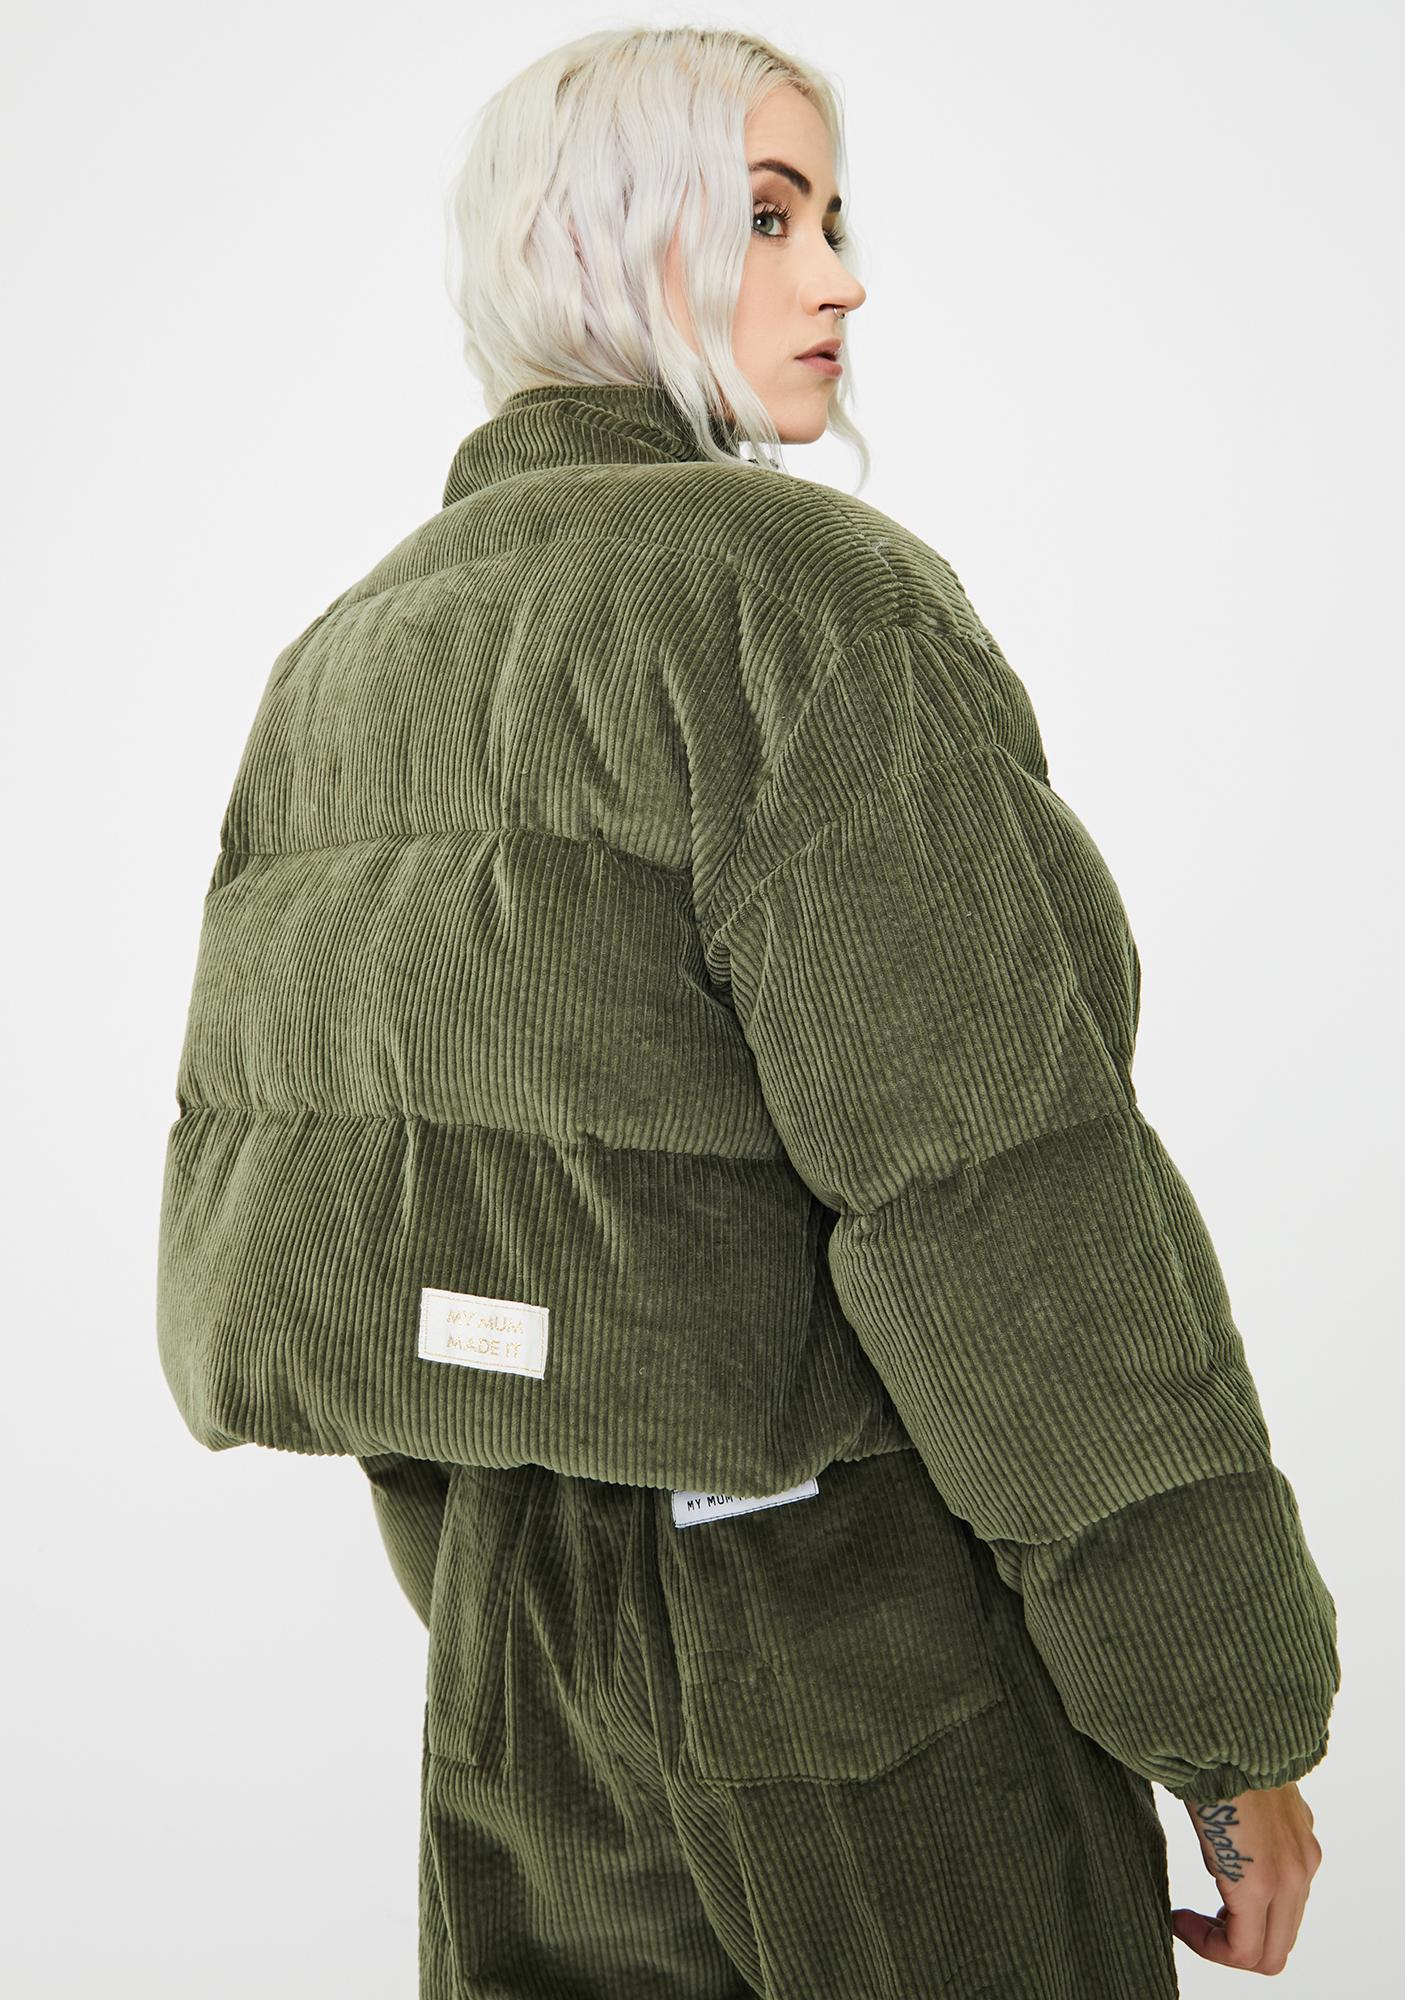 My Mum Made It Corduroy Puffer Jacket